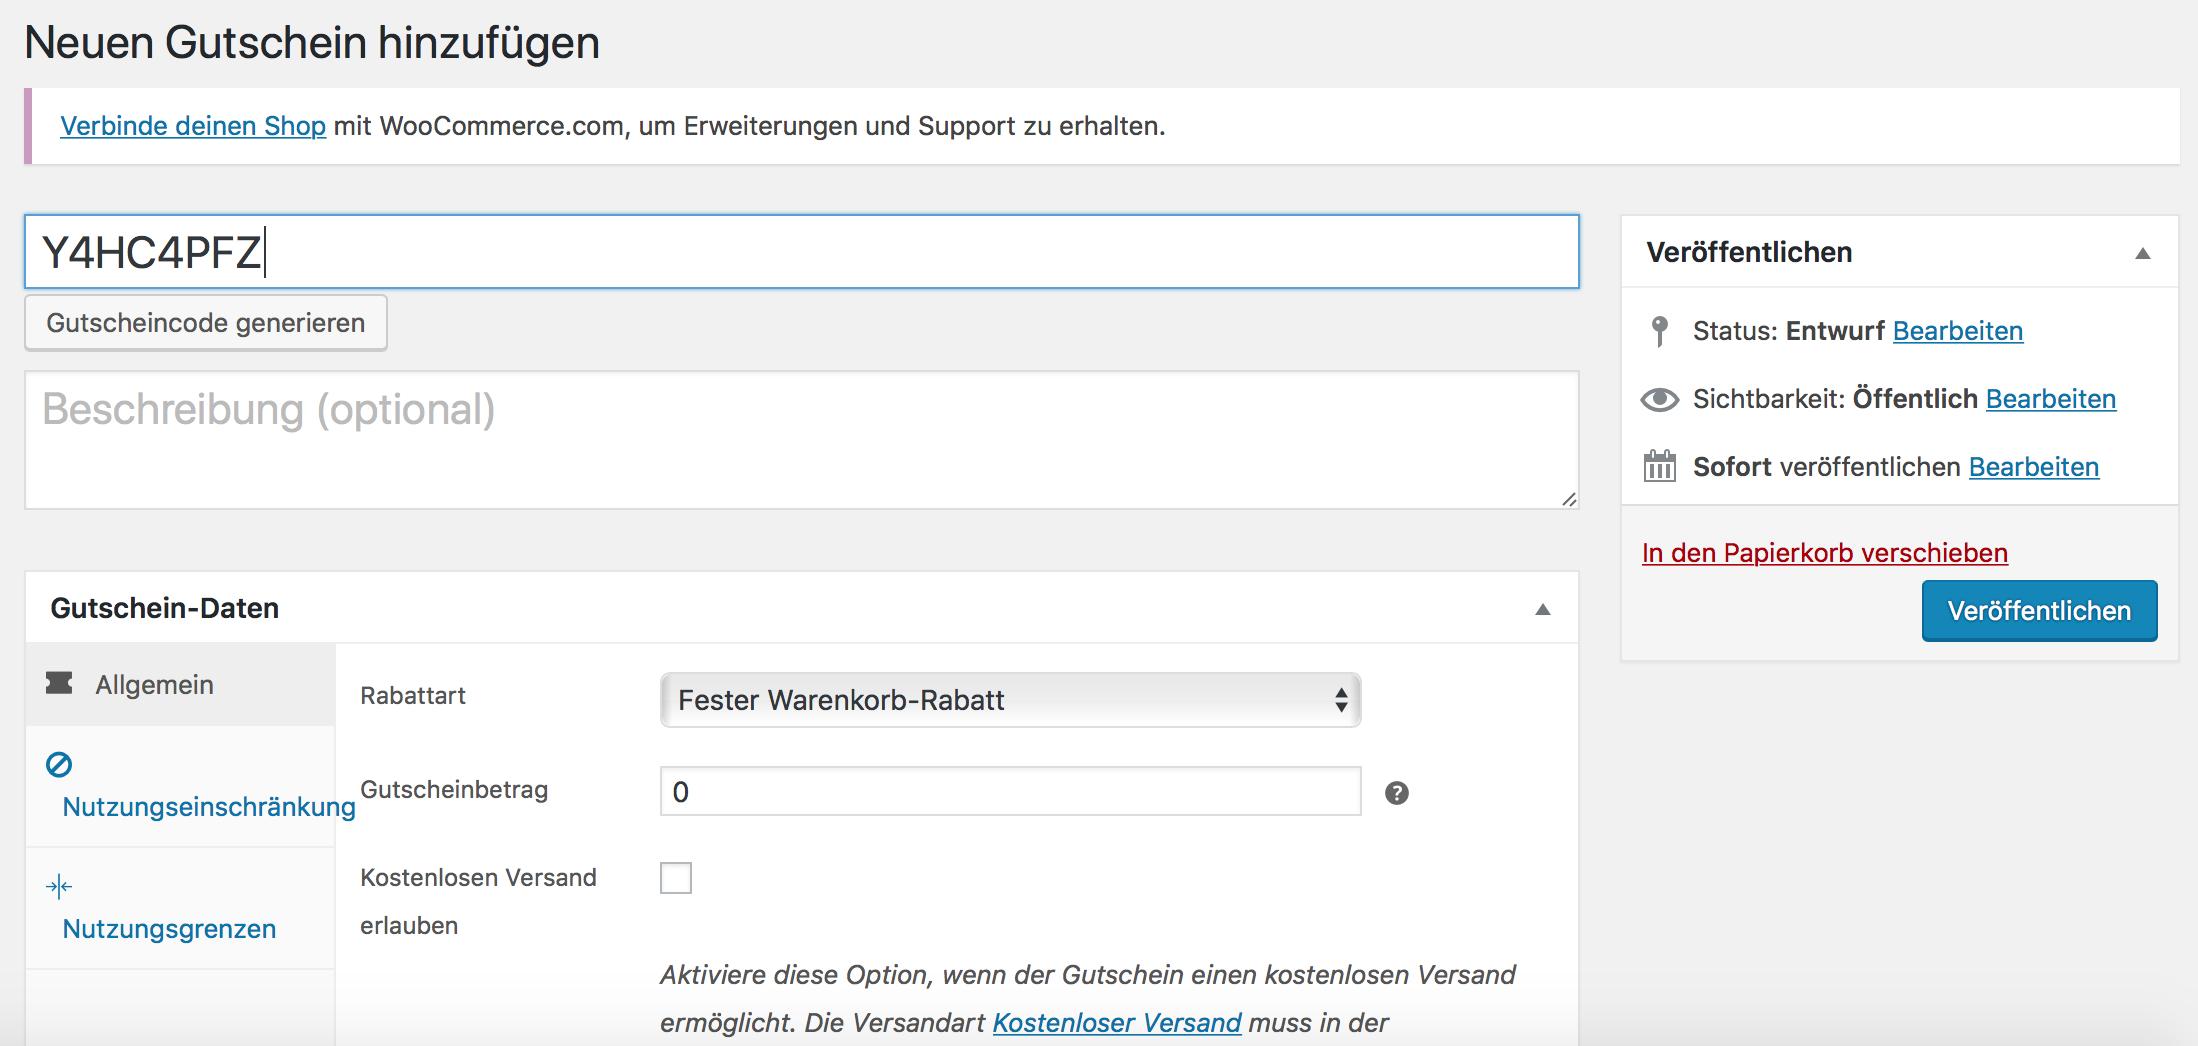 Gutscheincode-Generator in WooCommerce 3.7